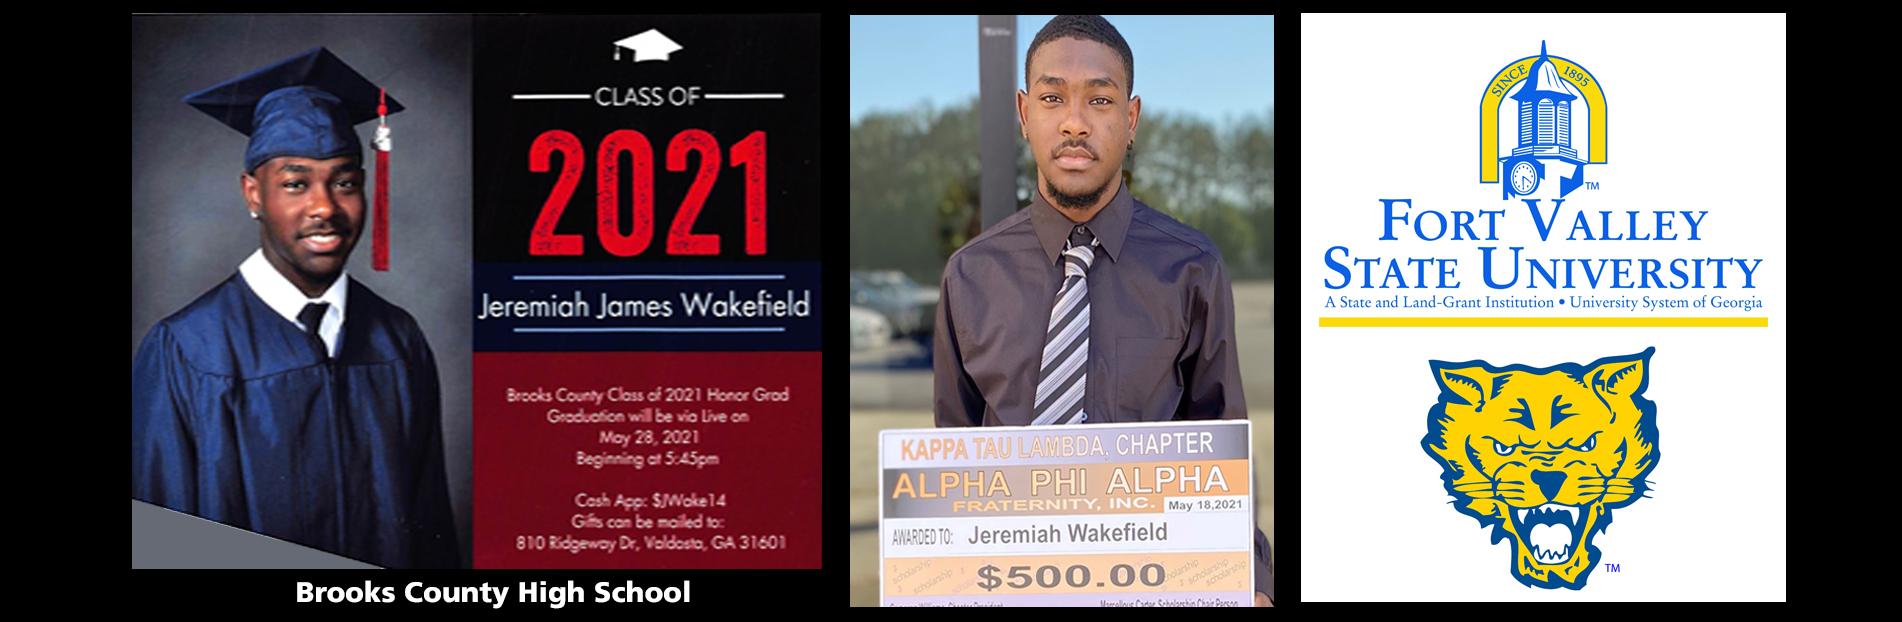 2021 Scholarship Winner: Jeremiah Wakefield